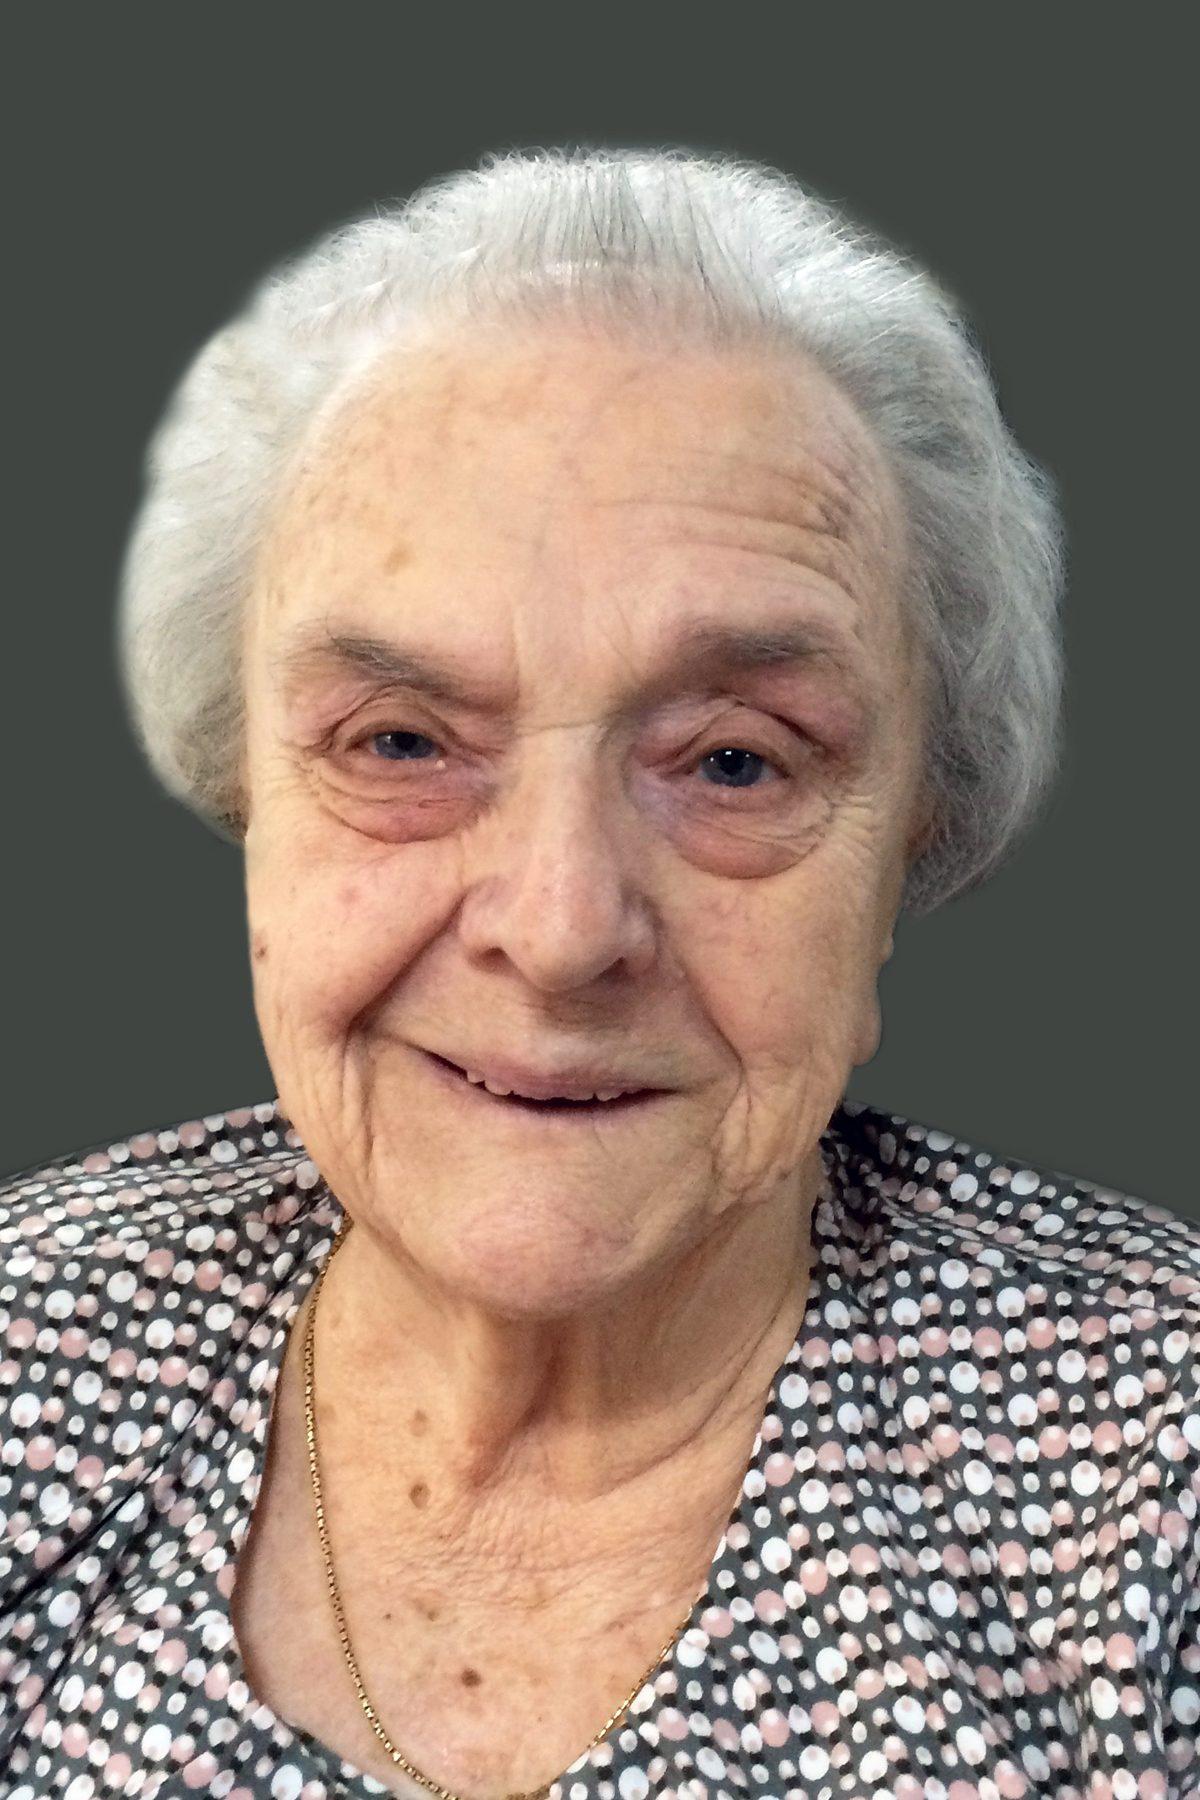 Gertrude Marting